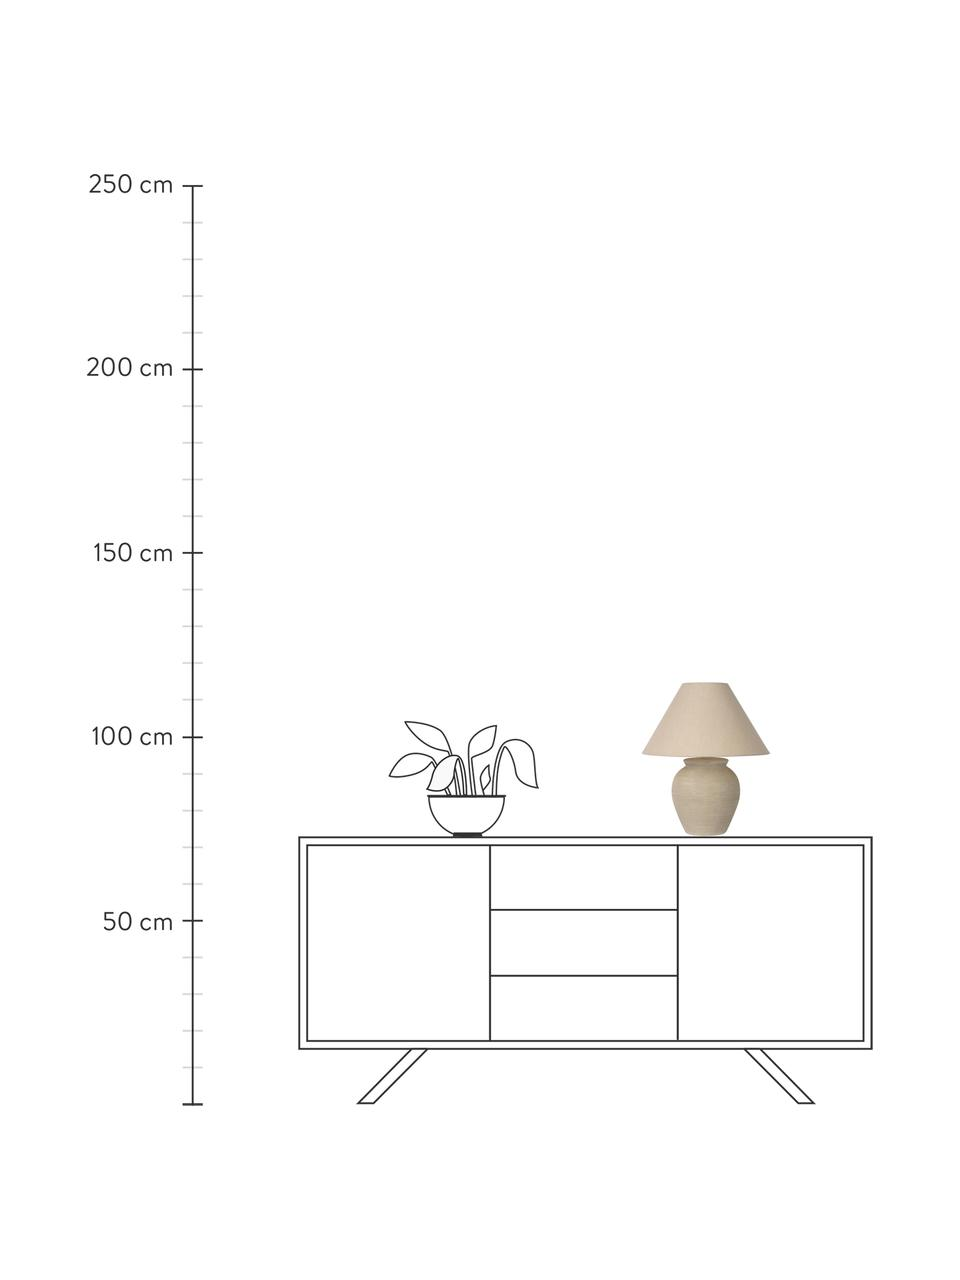 Keramik-Tischlampe Ramzi, Lampenschirm: Baumwolle, Lampenfuß: Keramik, Beige, Ø 34 x H 42 cm